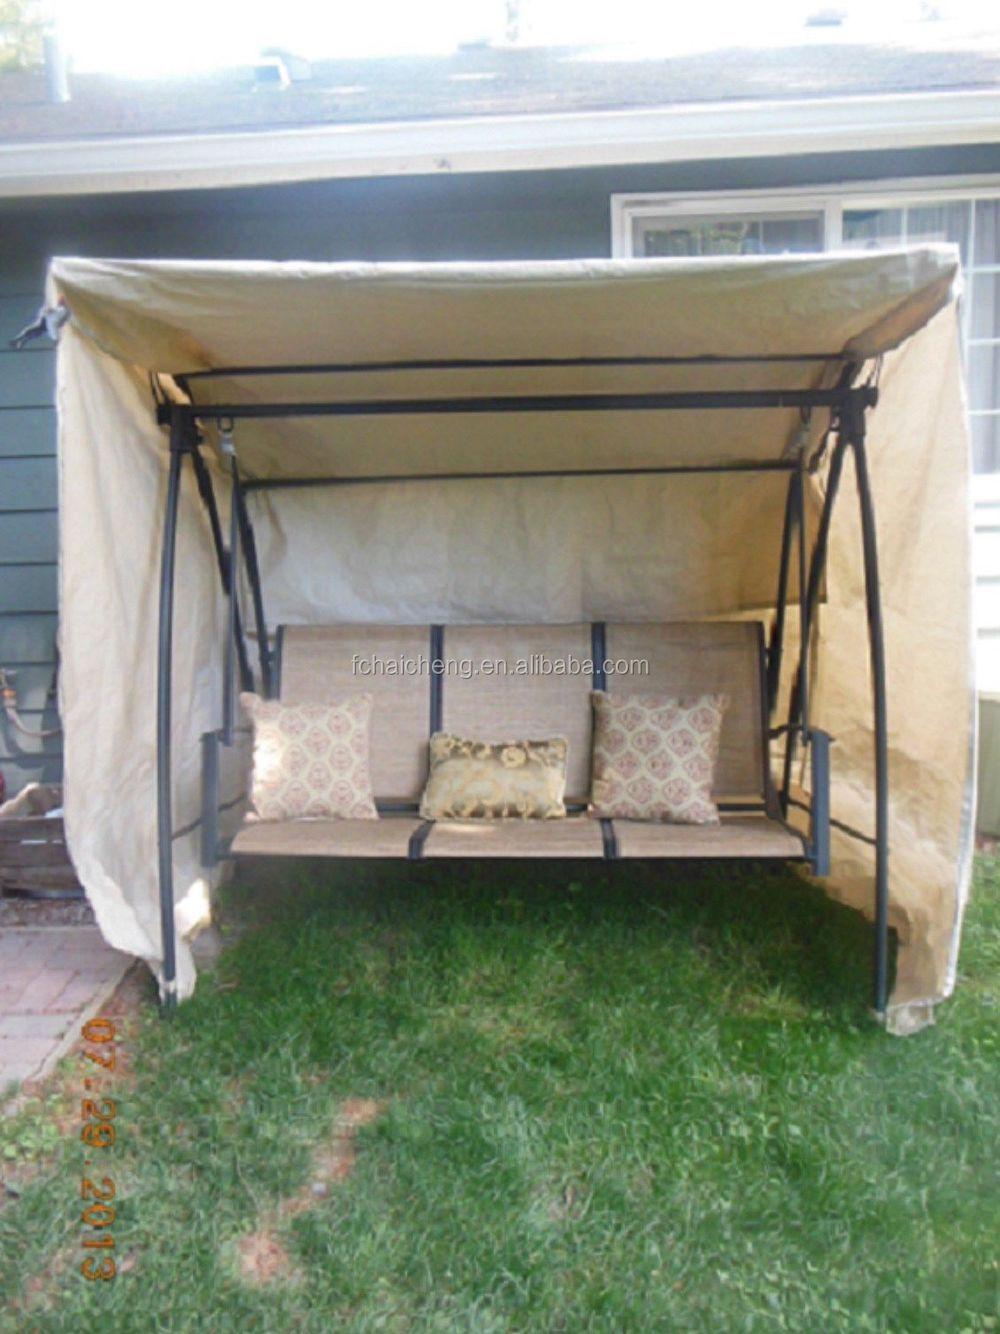 Outdoor Cover Tarp Tent Patio Furniture Swing Hammock